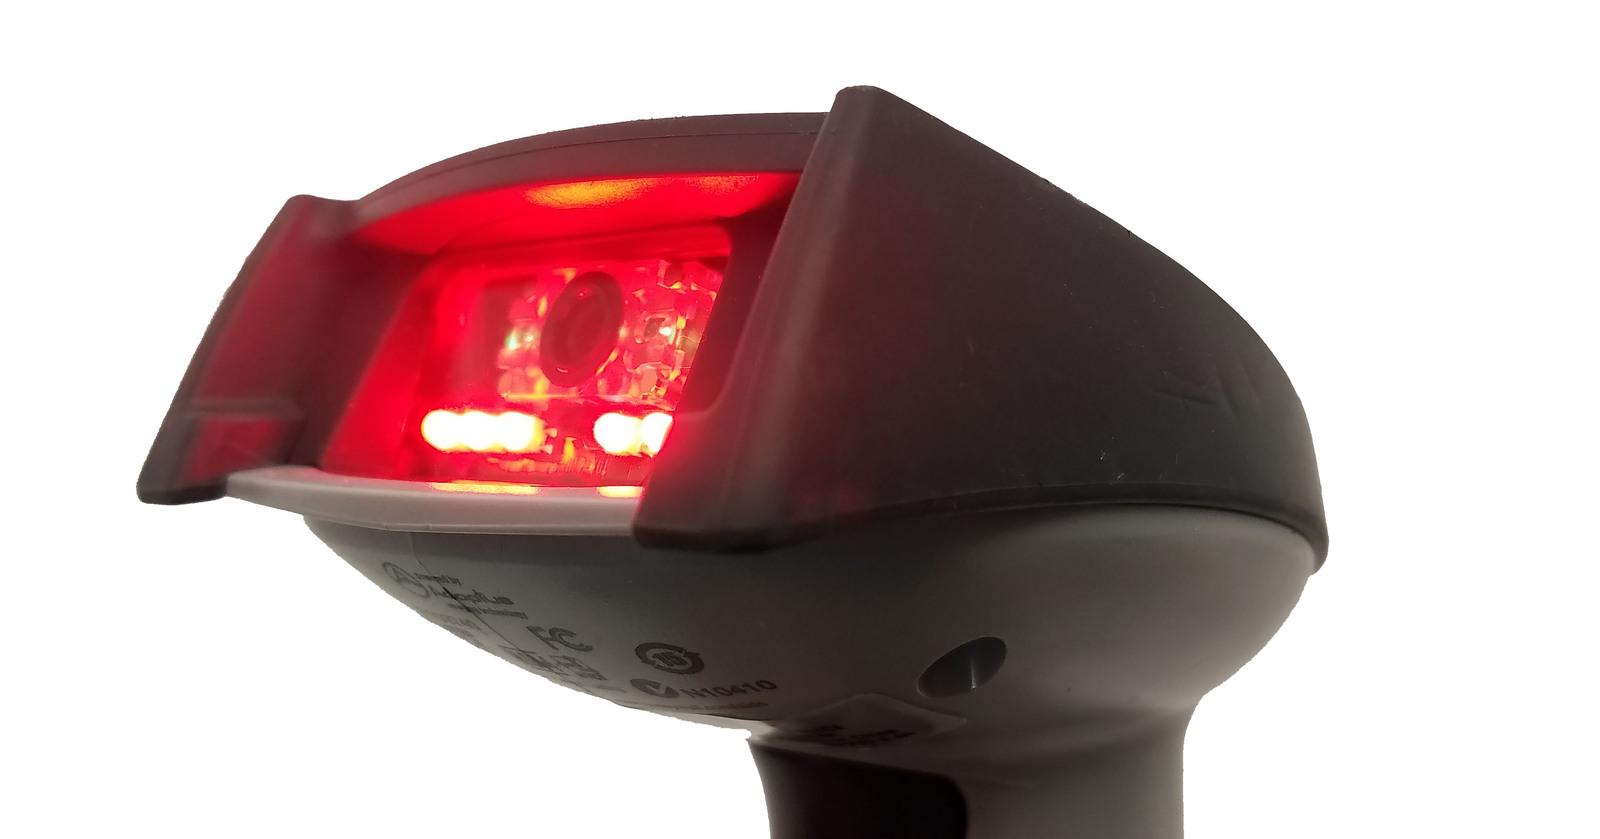 Honeywell 4600G Handheld Wired POS 1D/2D USB Barcode Scanner Bin: 11